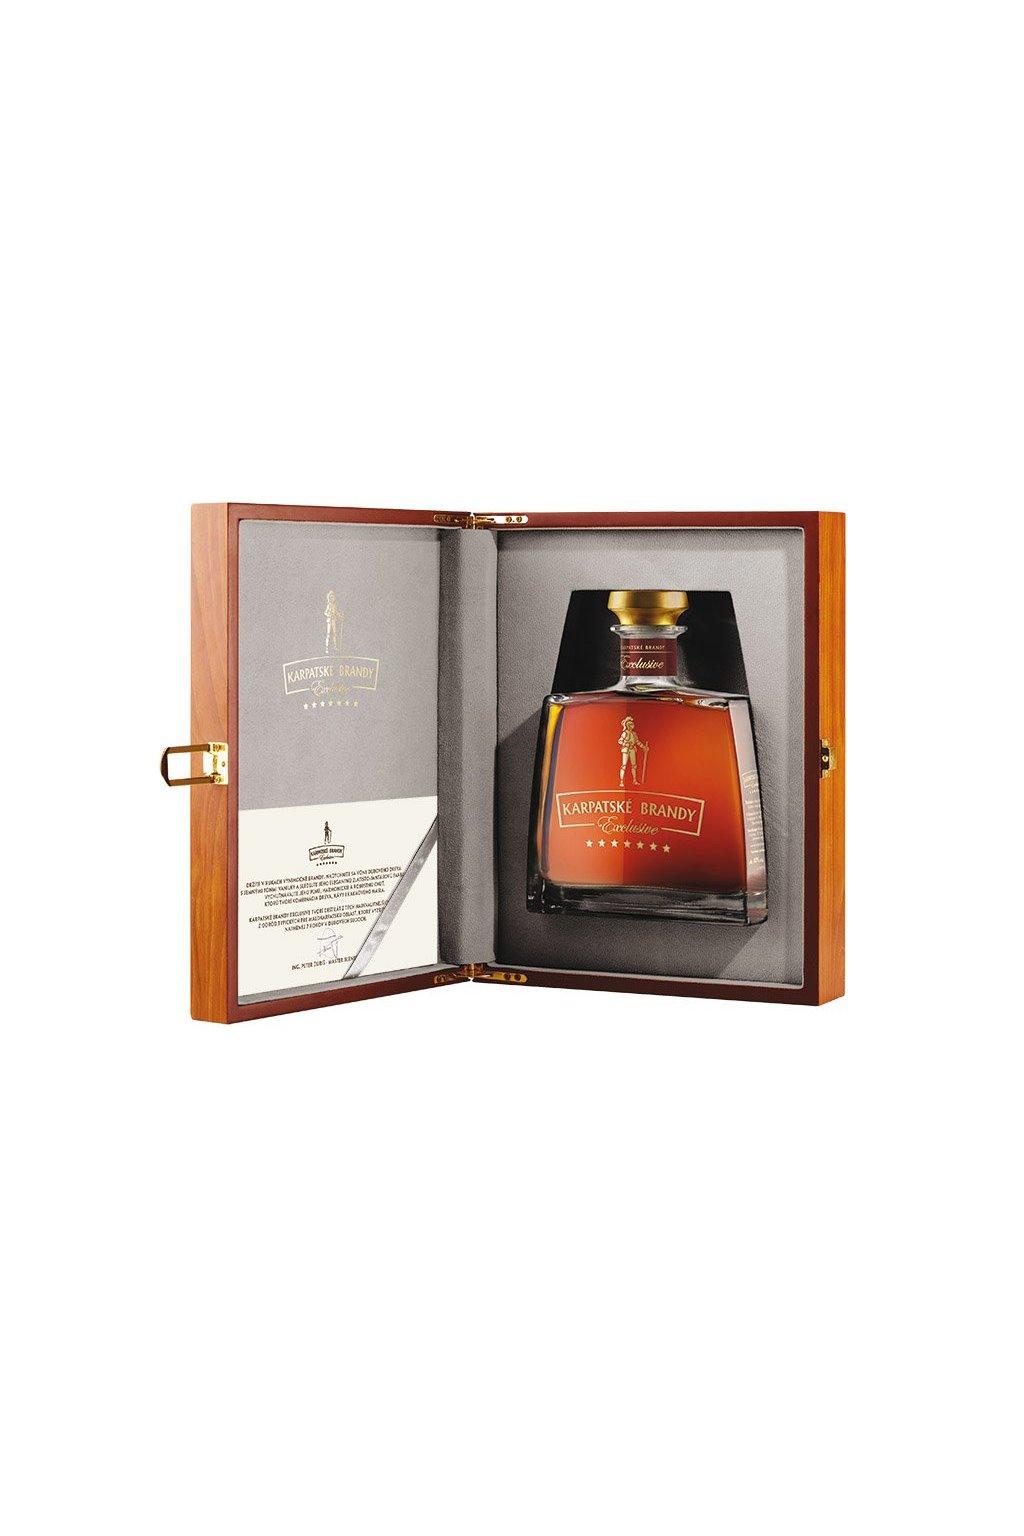 karpatske brandy exclusive